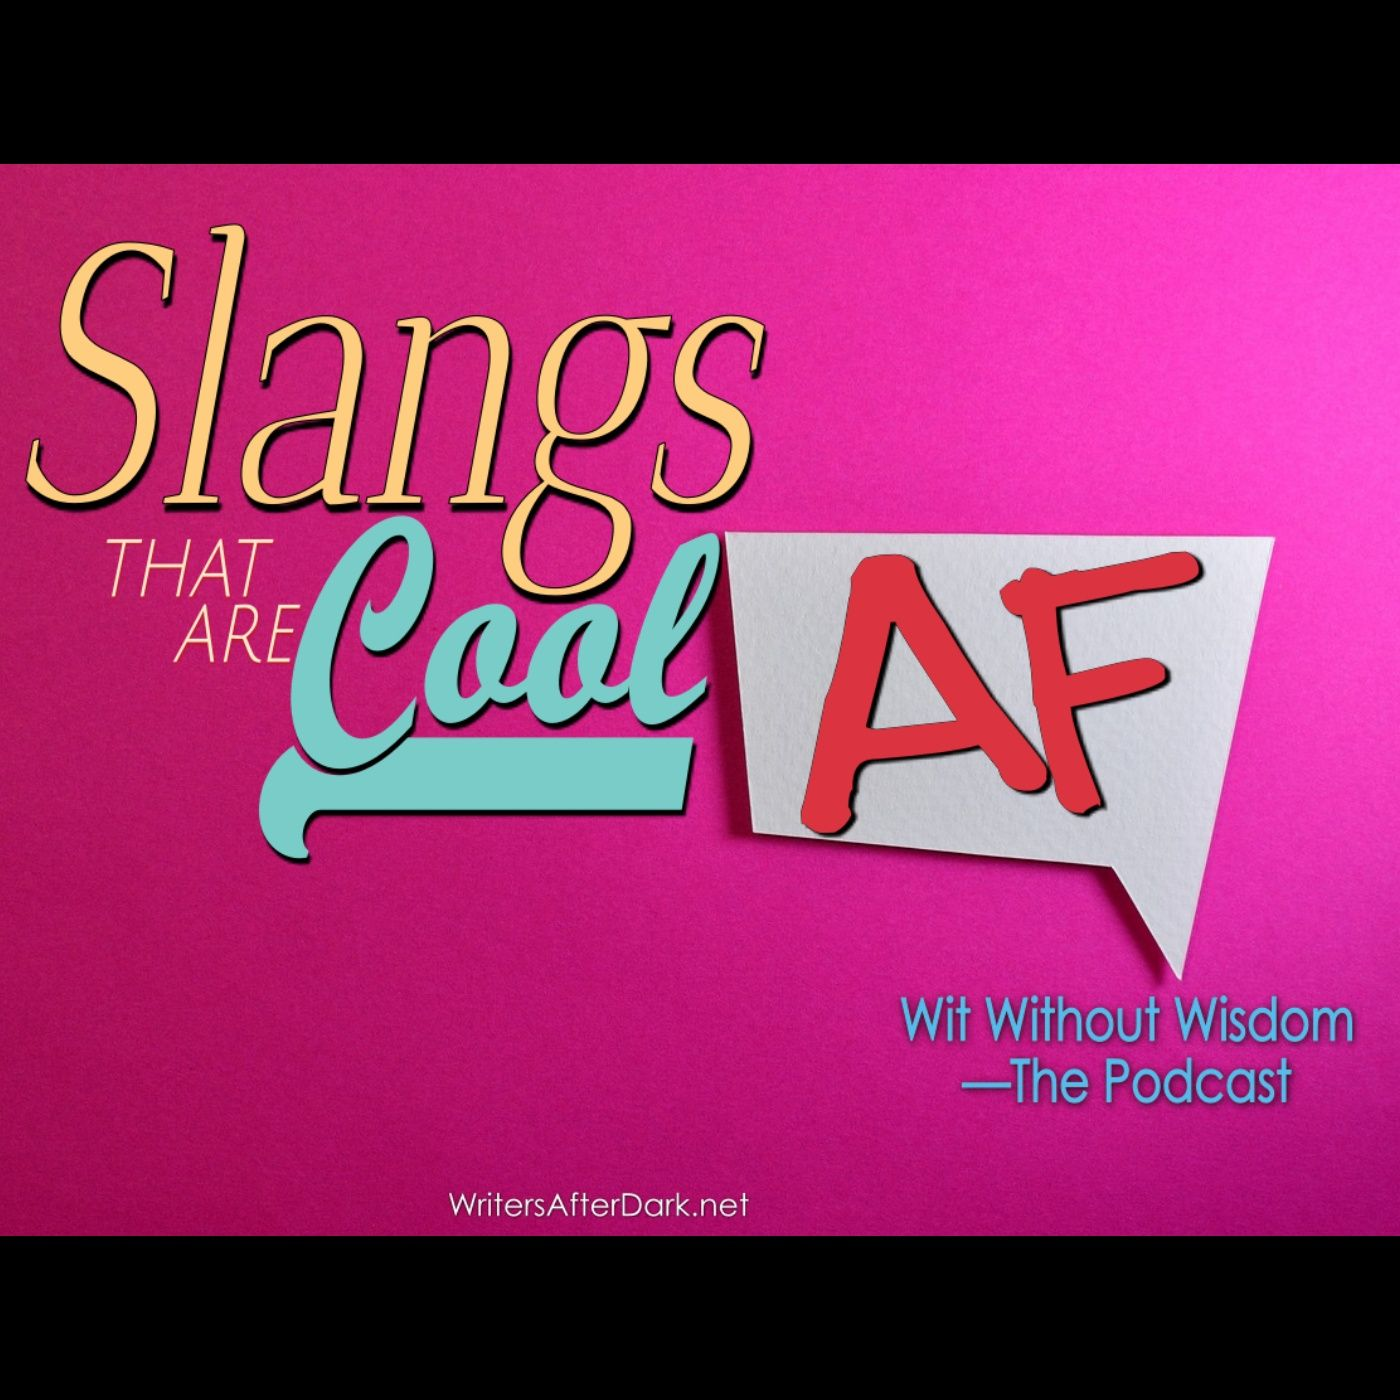 Slangs that are Cool AF